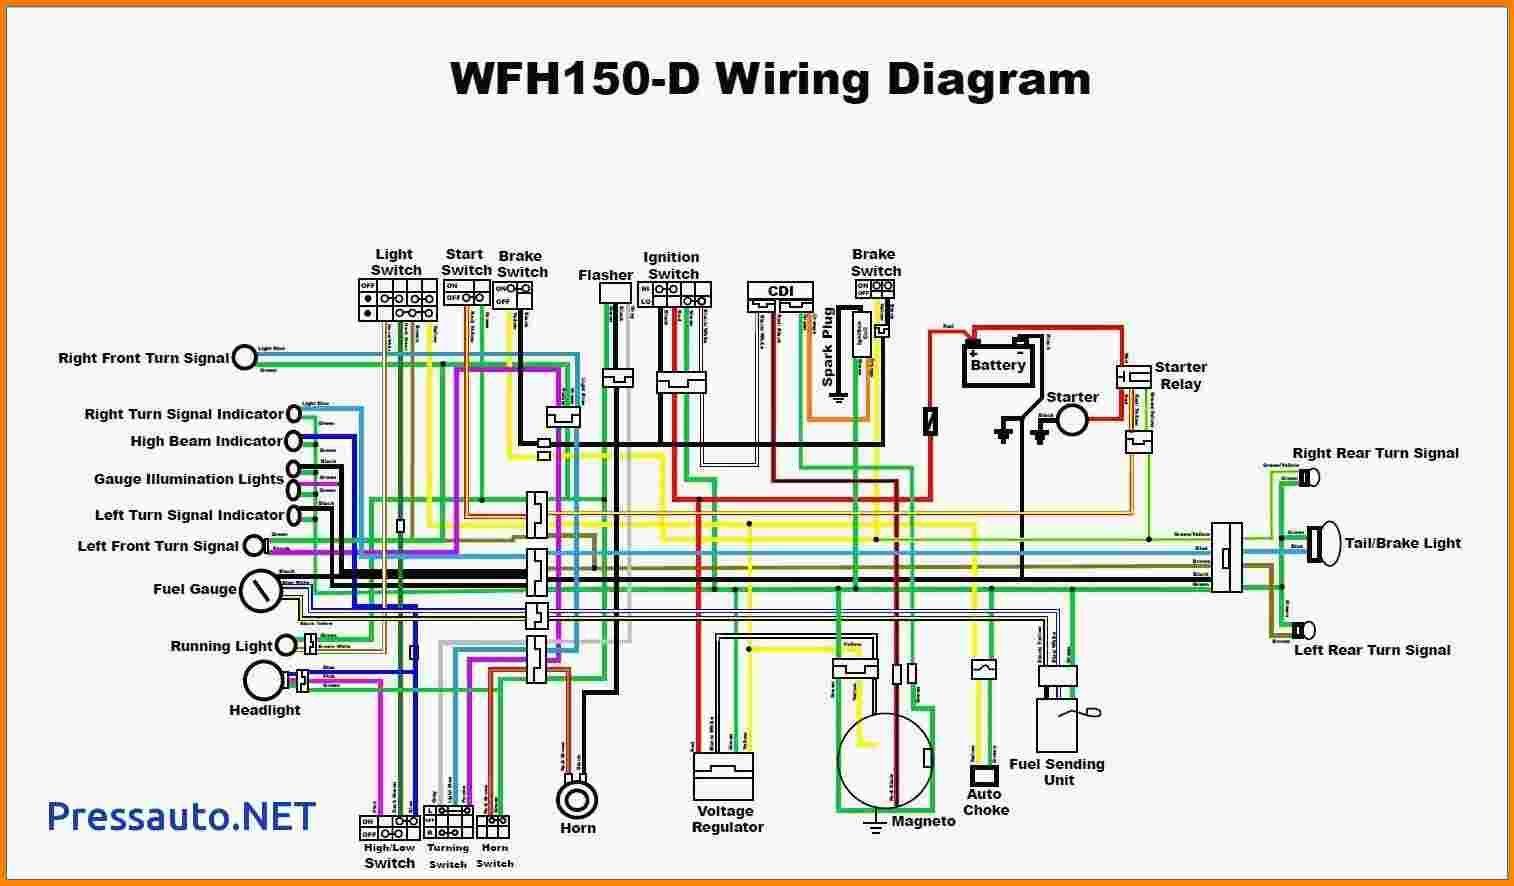 Chinese Atv Cdi Wiring Diagram - Wiring Diagram Sourcesavemoney.gg